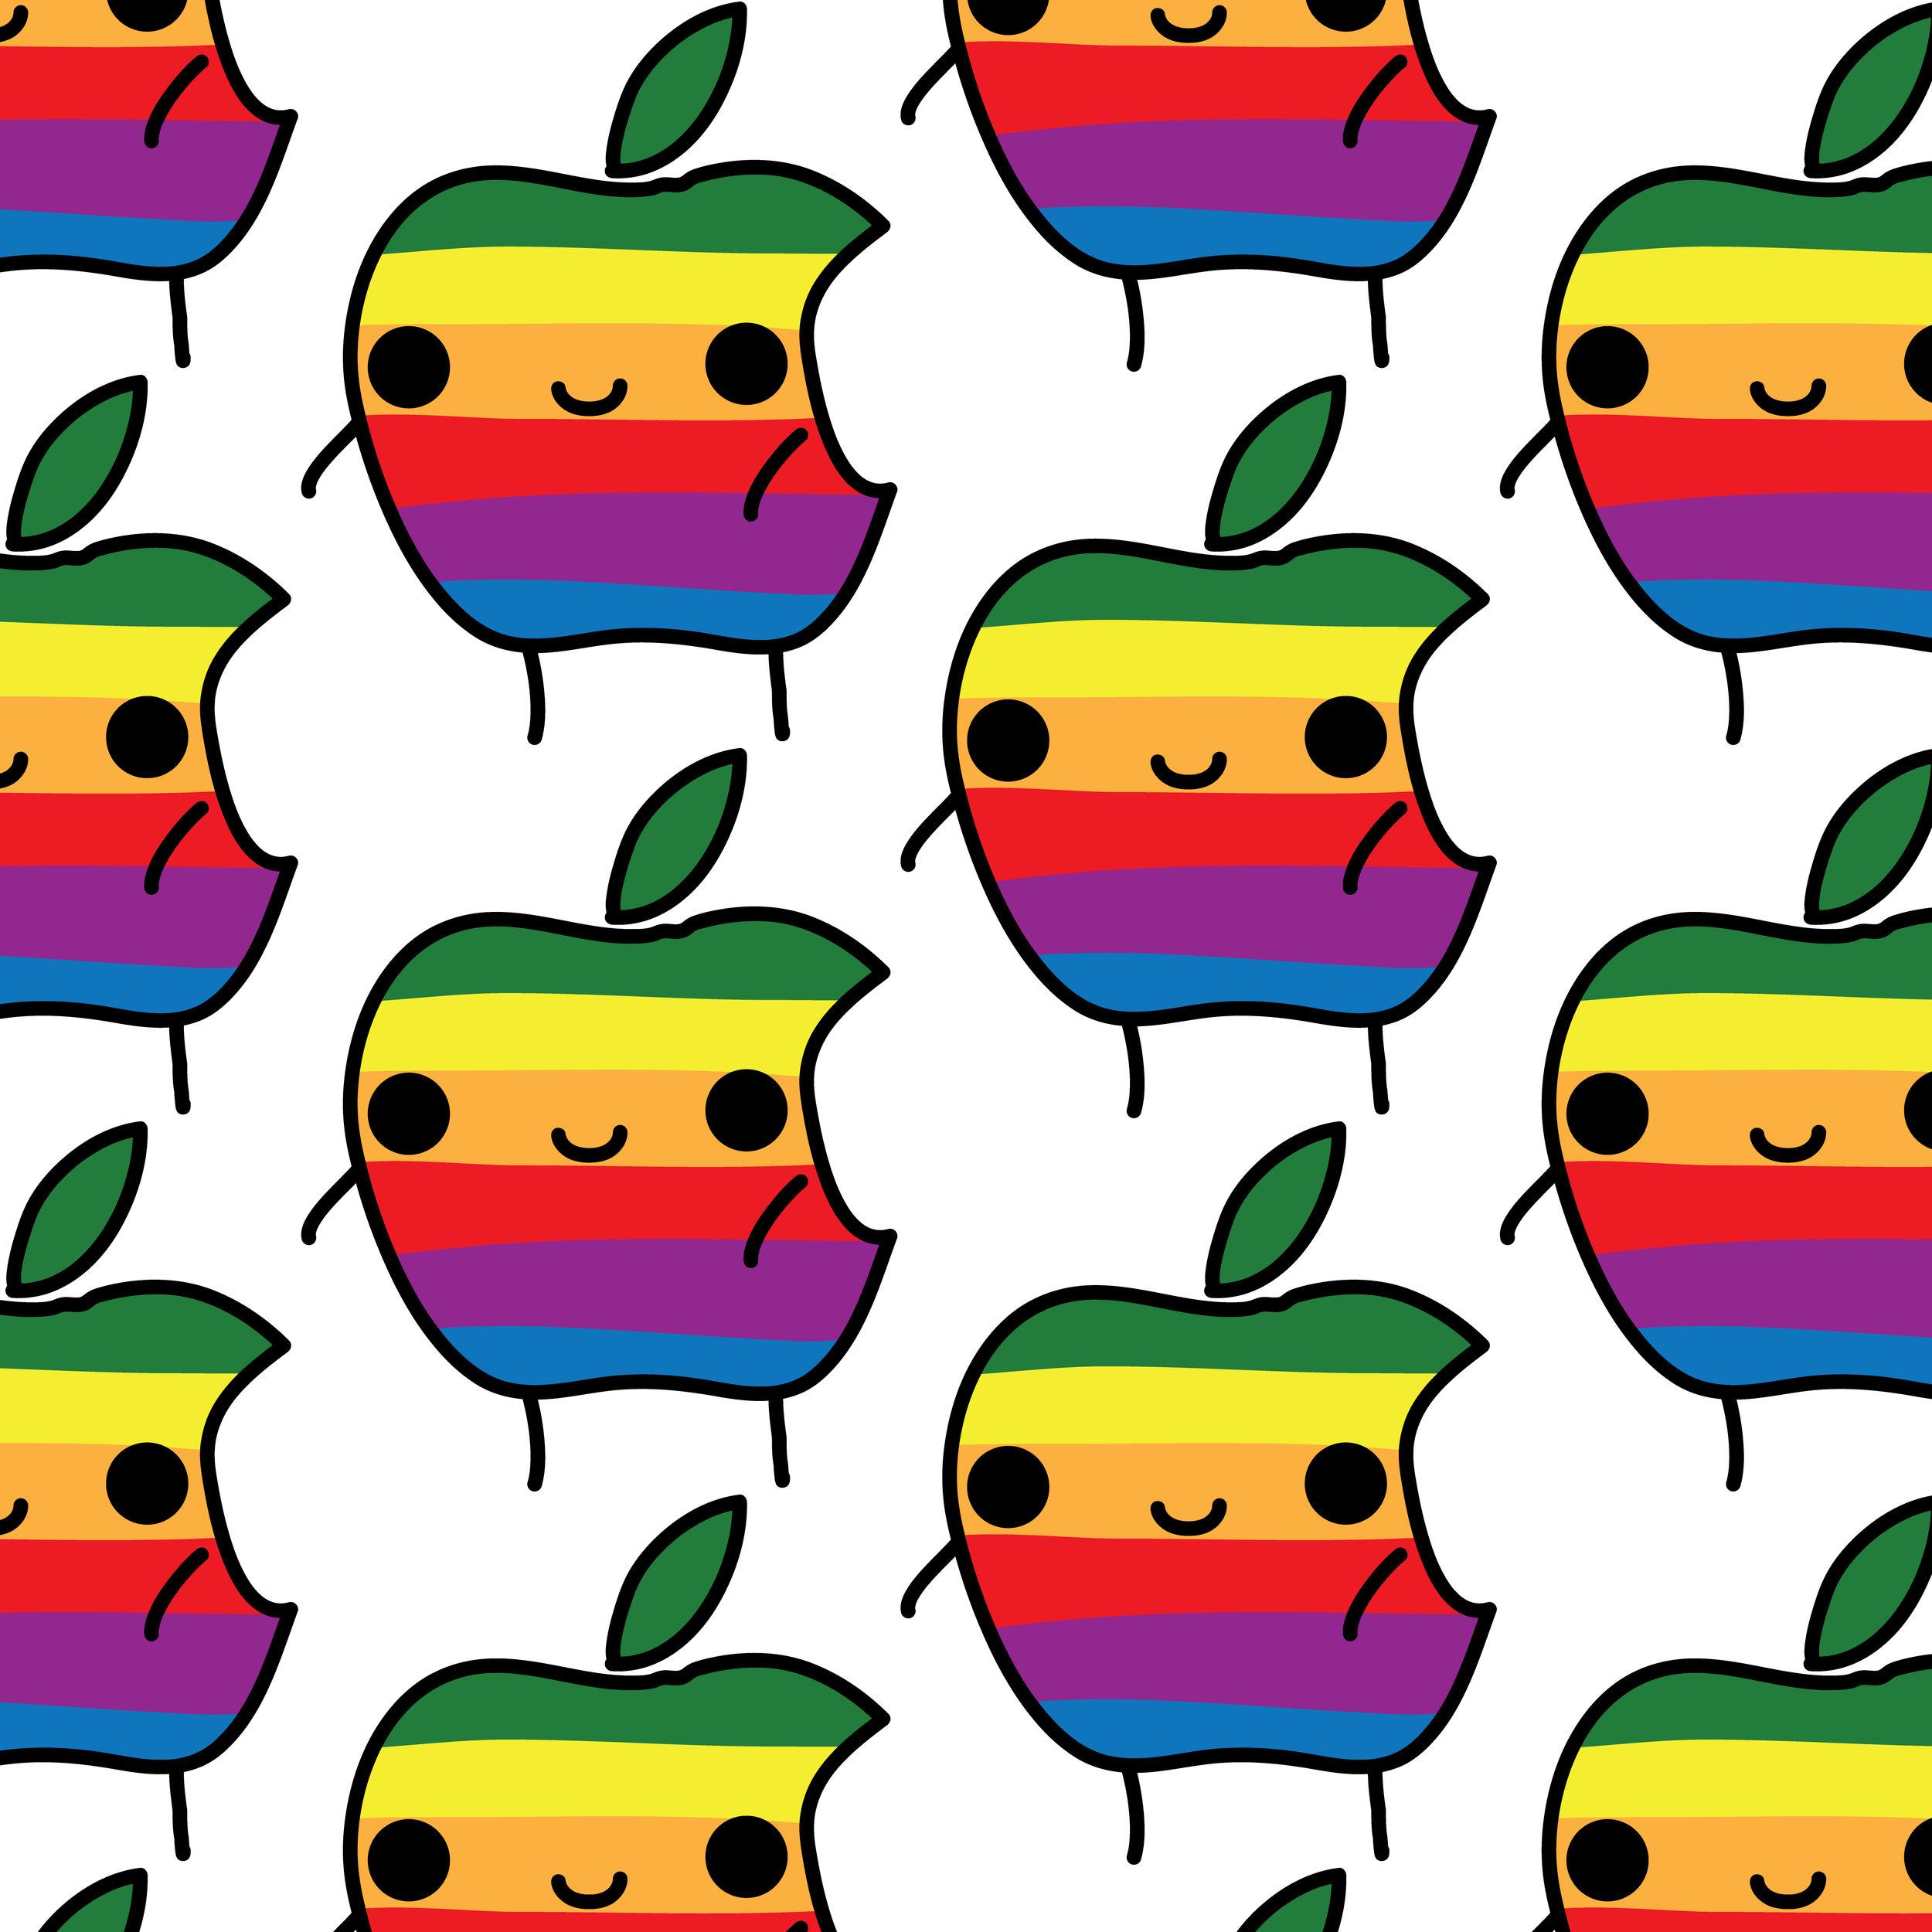 shower-pattern-apple-man.jpg